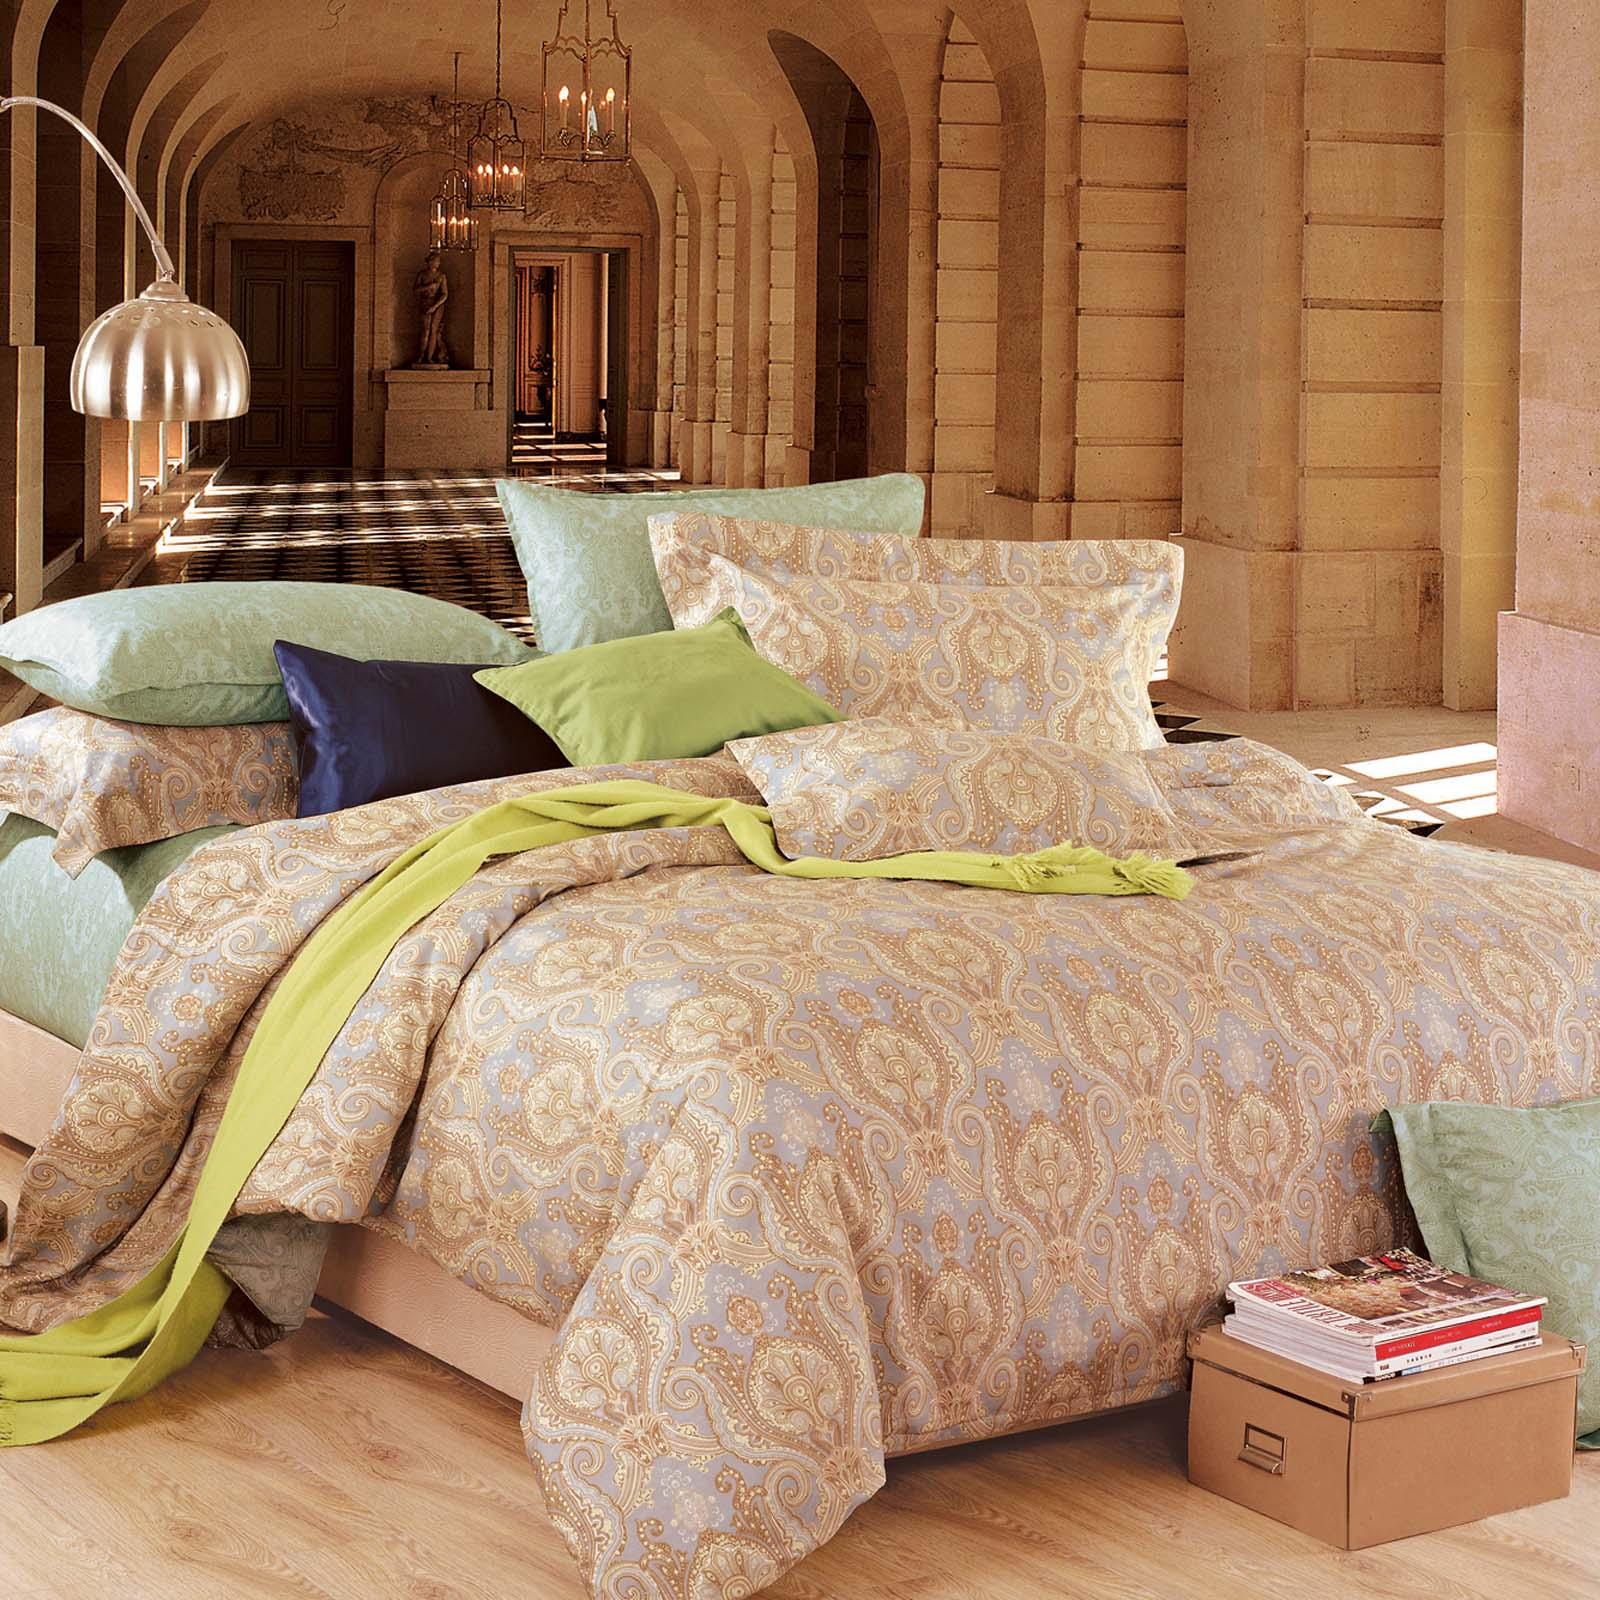 North Home Utopia 100% Cotton 4pc Duvet Cover Set Queen - image 1 of 1